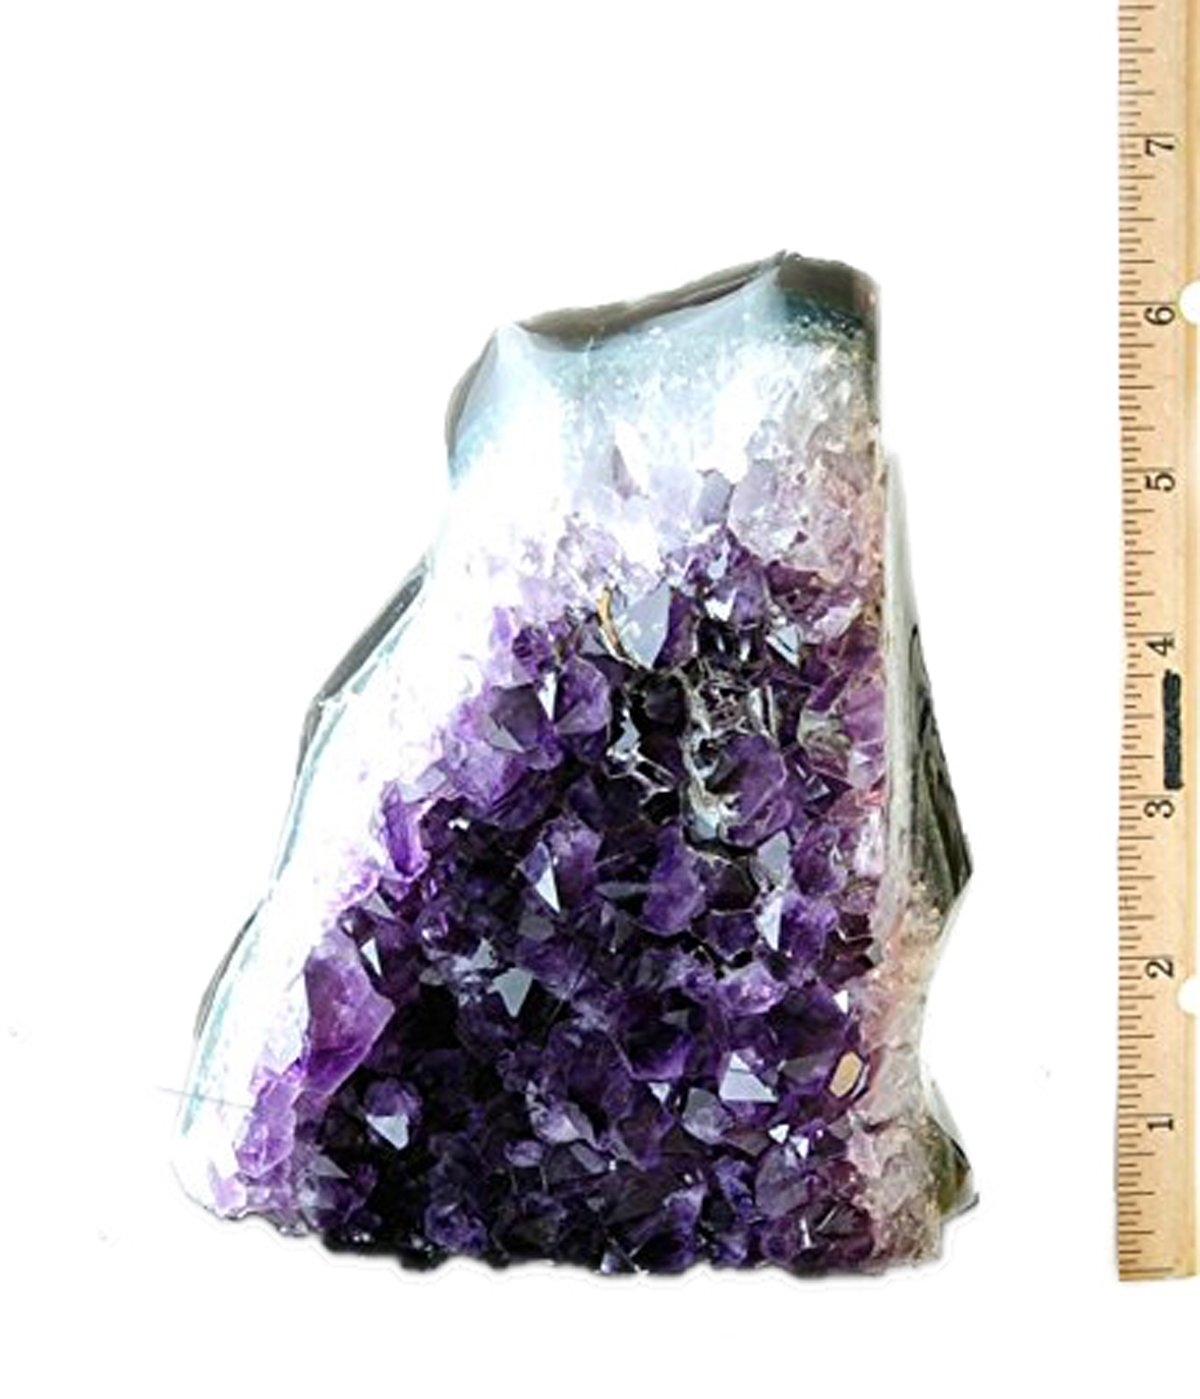 JIC Gem Class 1 Polished Deep Purple Uruguay Amethyst Upright Standing Stone Home Decor : 6-7 Lb by JIC Gem (Image #6)